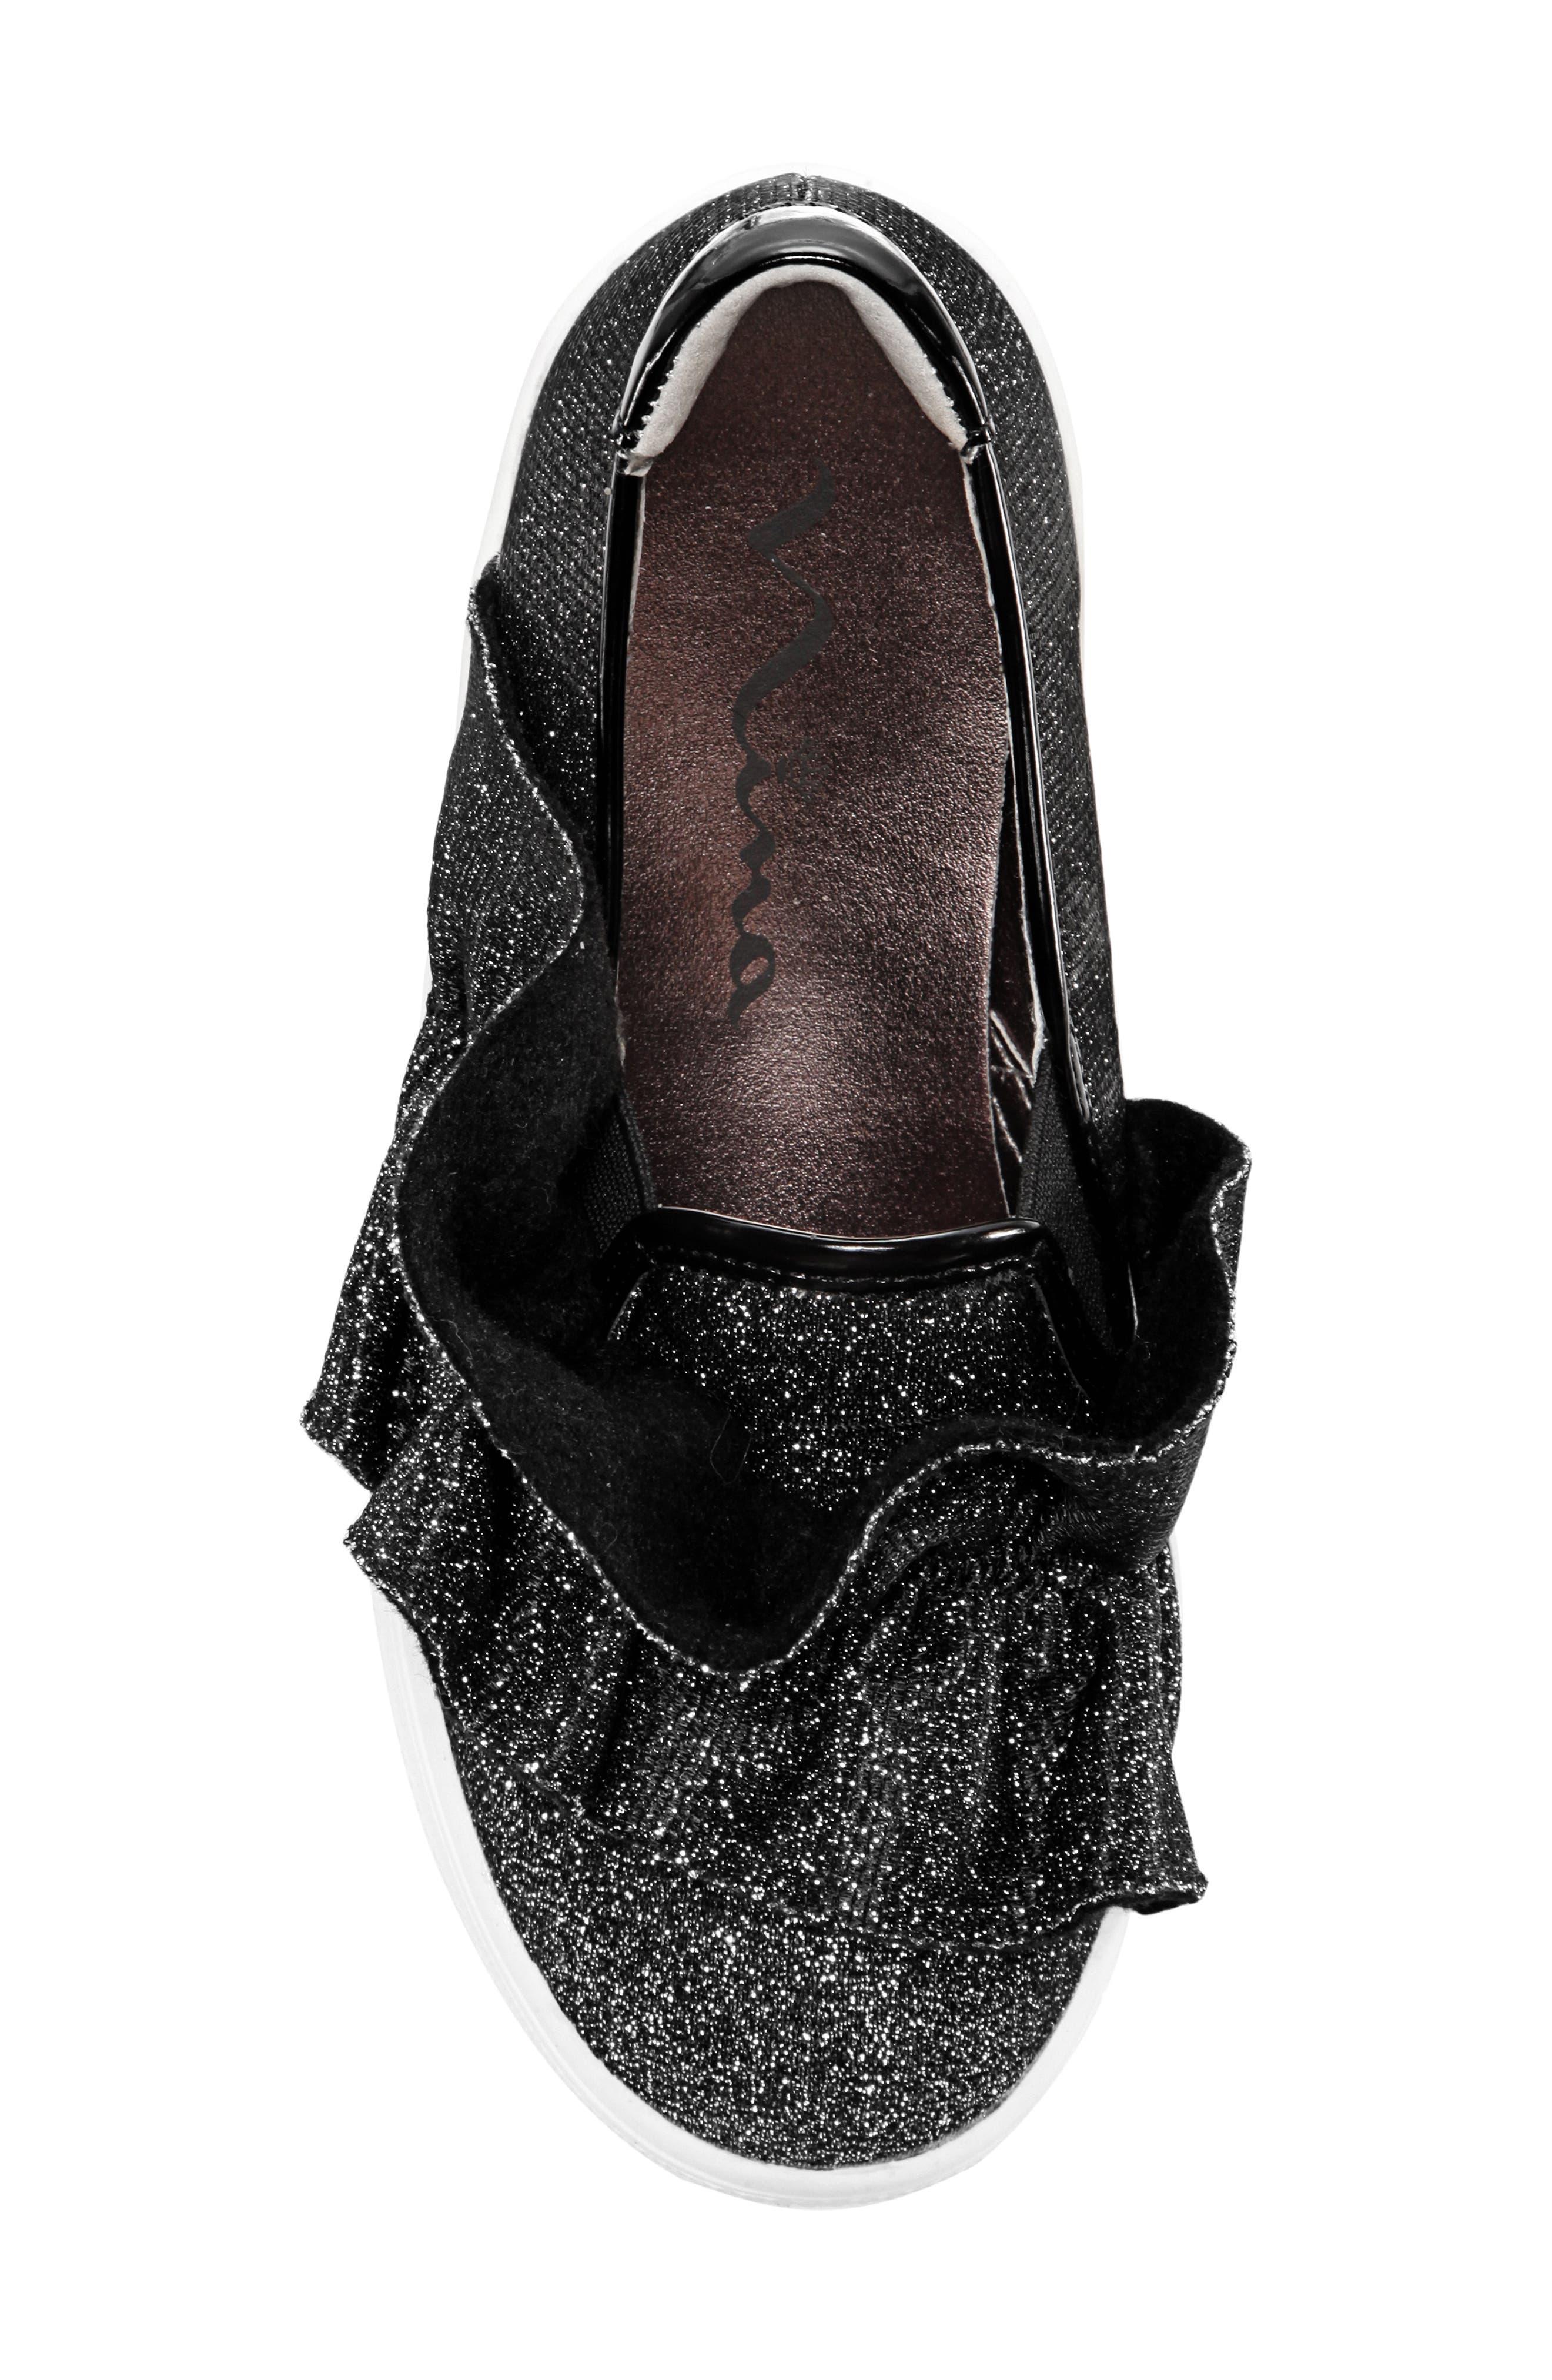 Ivani Slip-On Sneaker,                             Alternate thumbnail 5, color,                             BLACK SPARKLE FABRIC